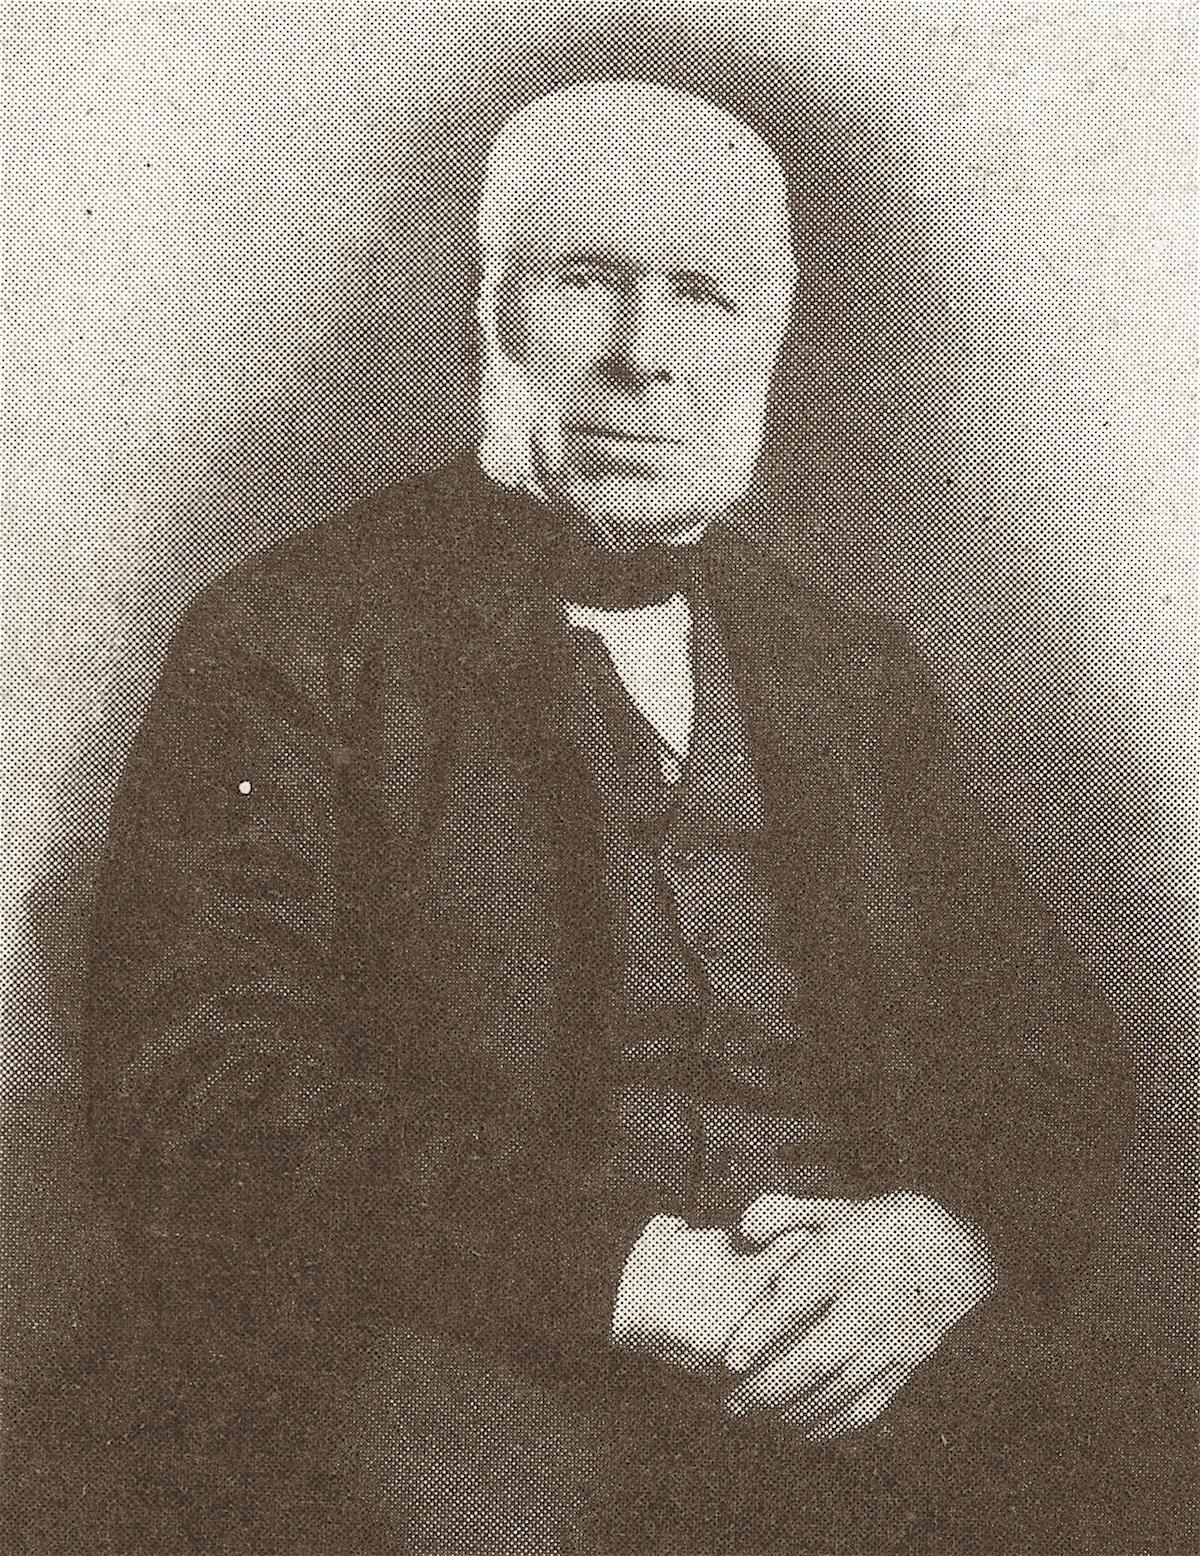 Amos Cruickshank